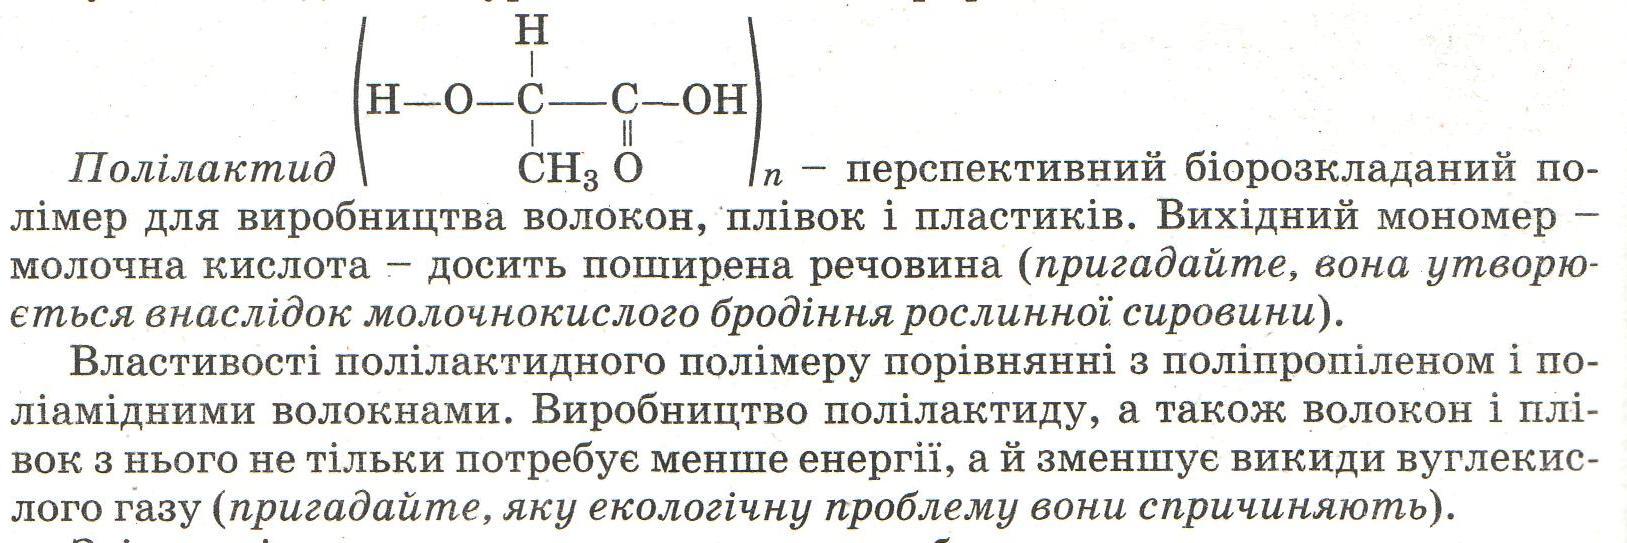 Полимономер